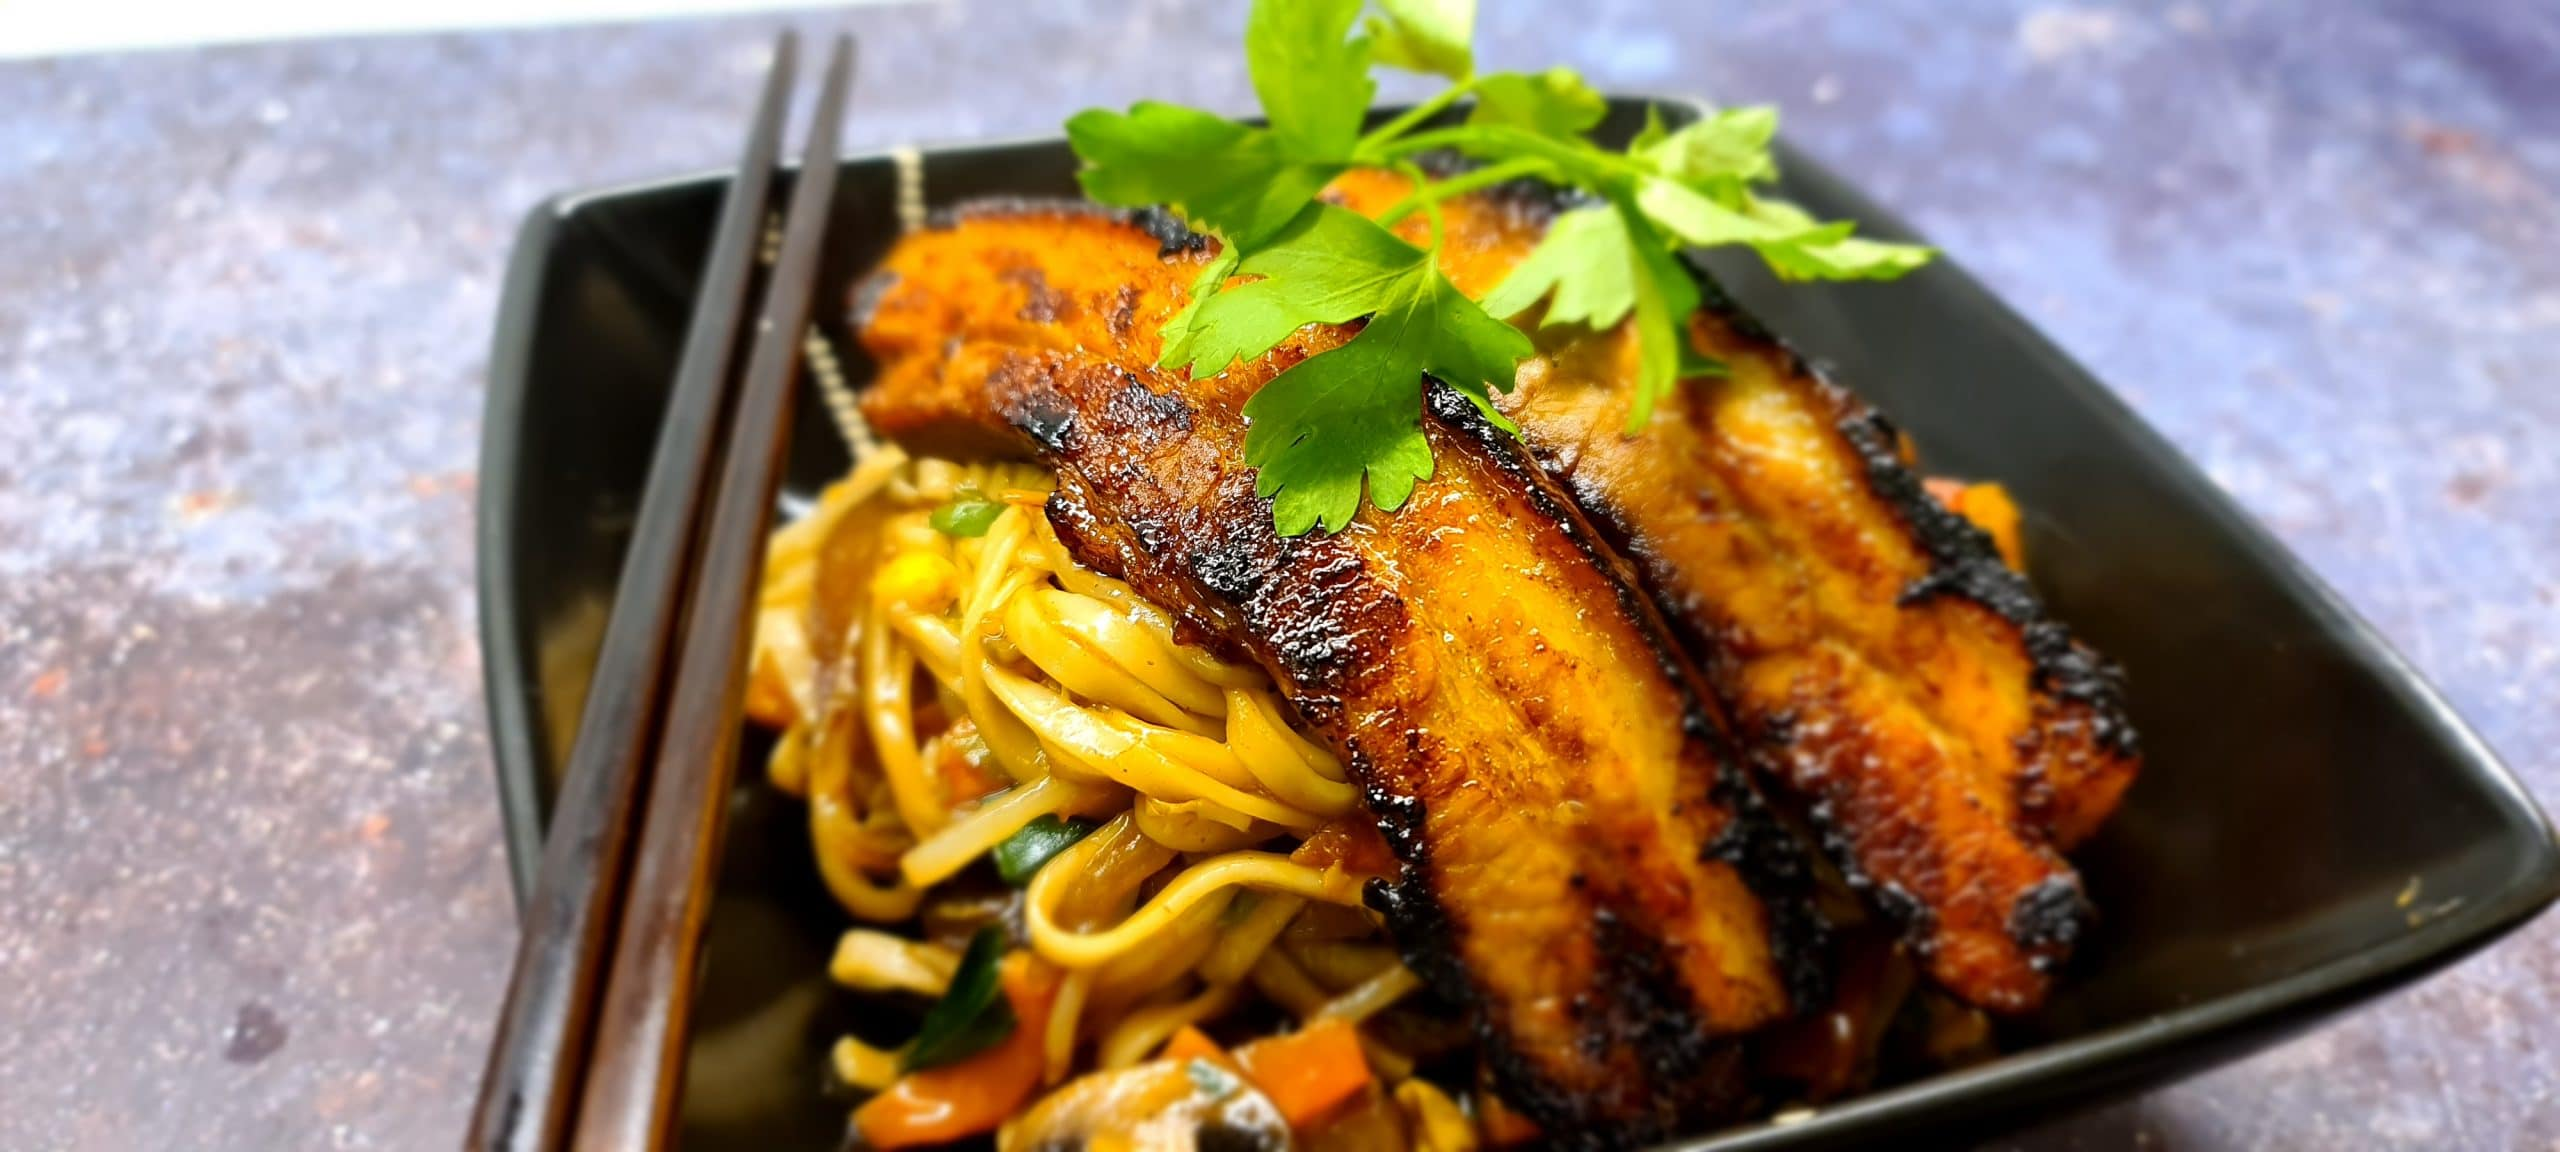 Stir Fry Udon Noodles with Char Siu Pork